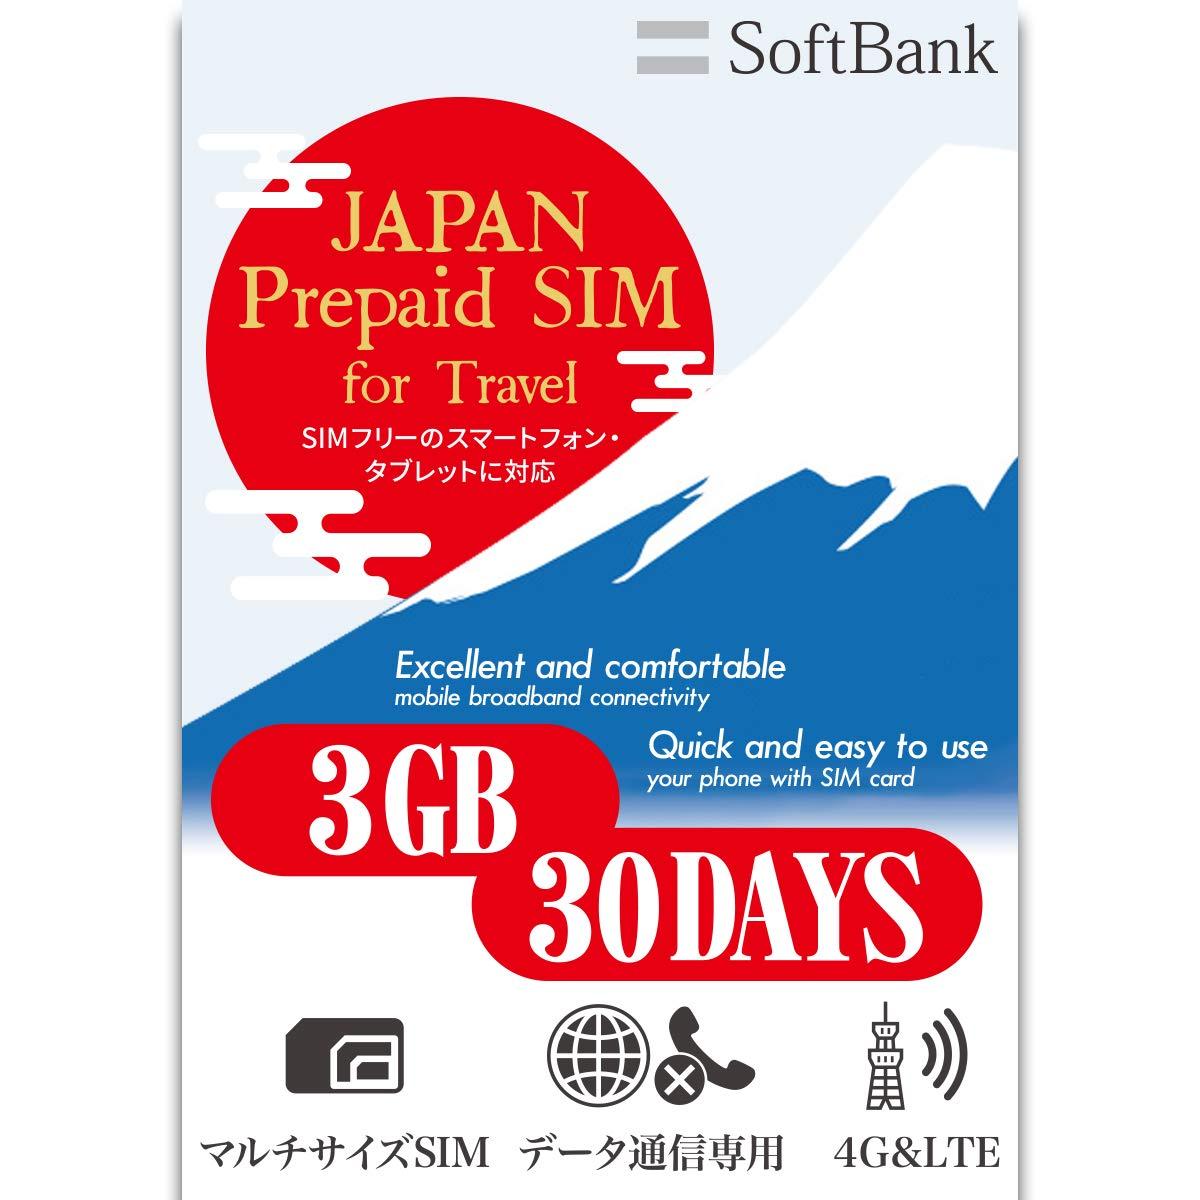 【P5倍 3/26 1:59まで】 プリペイドsim 日本 softbank プリペイドsimカード simカード プリペイド sim card 3GB 30日 マルチカットsim MicroSIM NanoSIM ソフトバンク 携帯 携帯電話